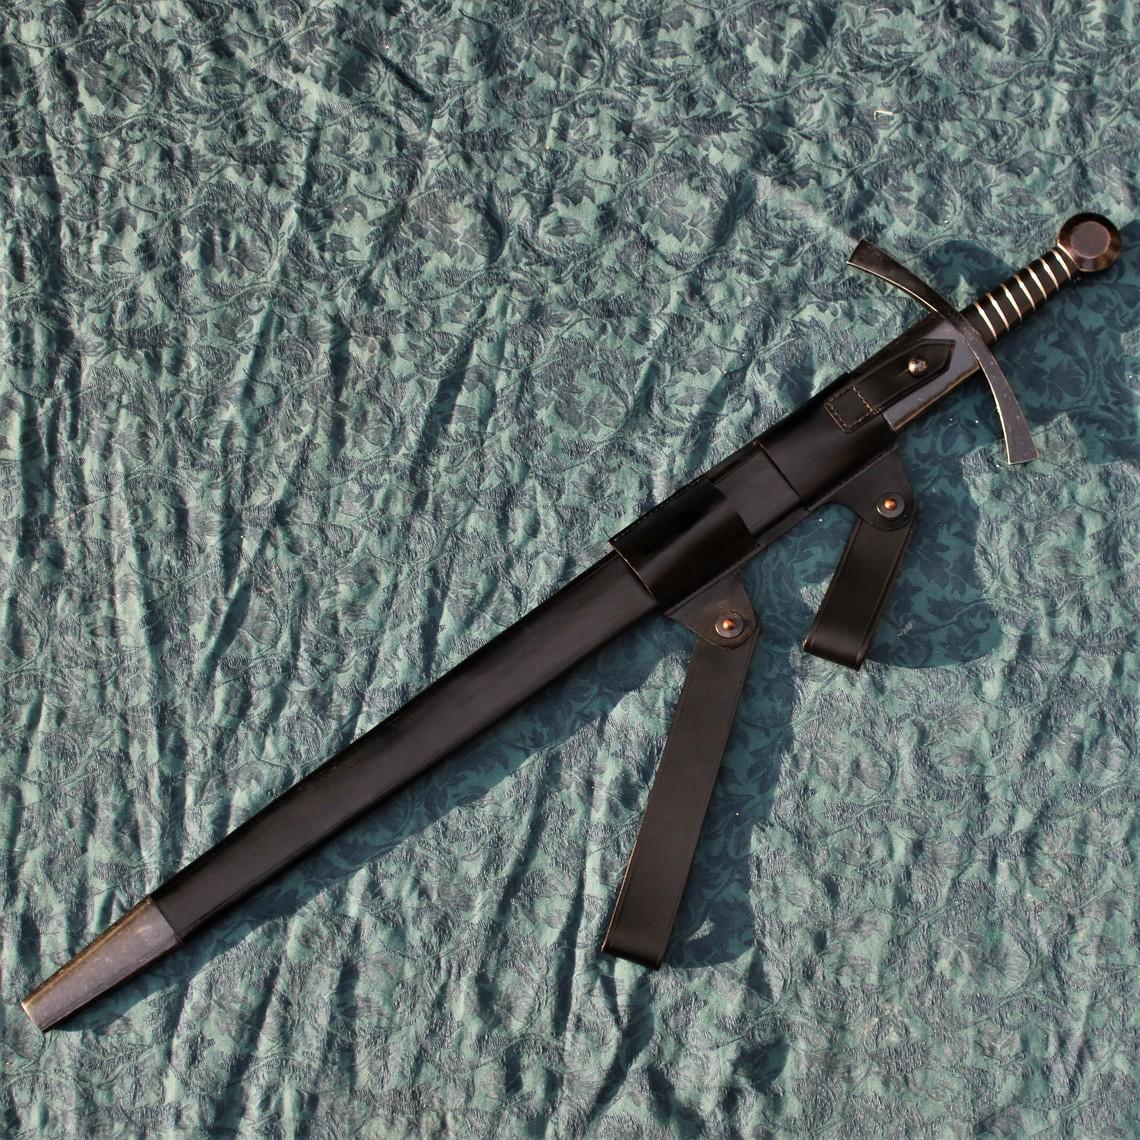 Windlass Steelcrafts Spada crociata Acro